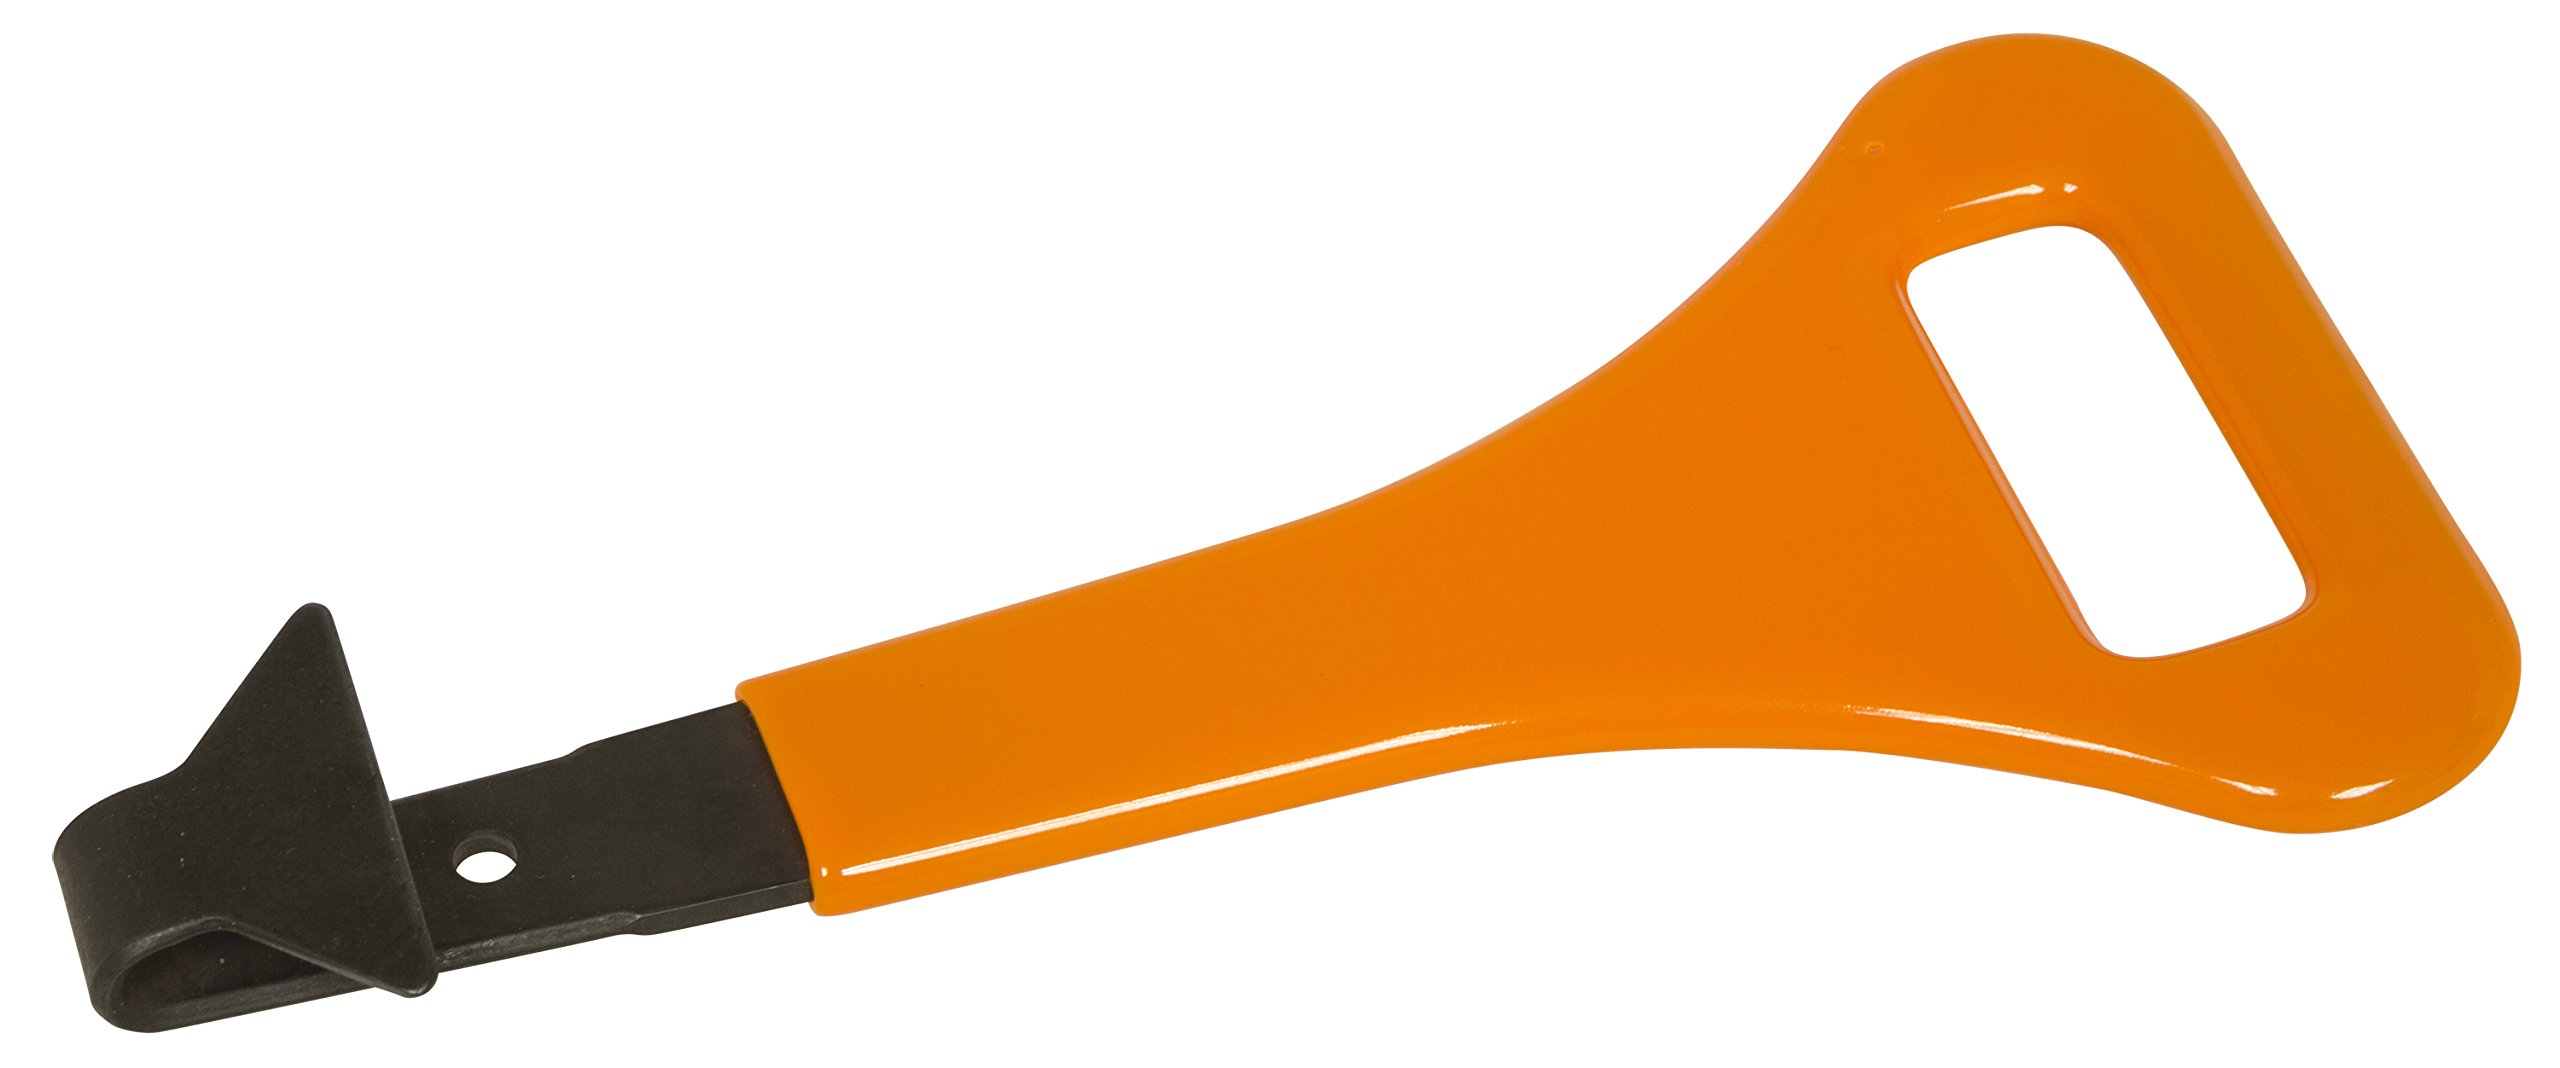 Lisle 35240 Belt Molding Tool Small by Lisle (Image #1)